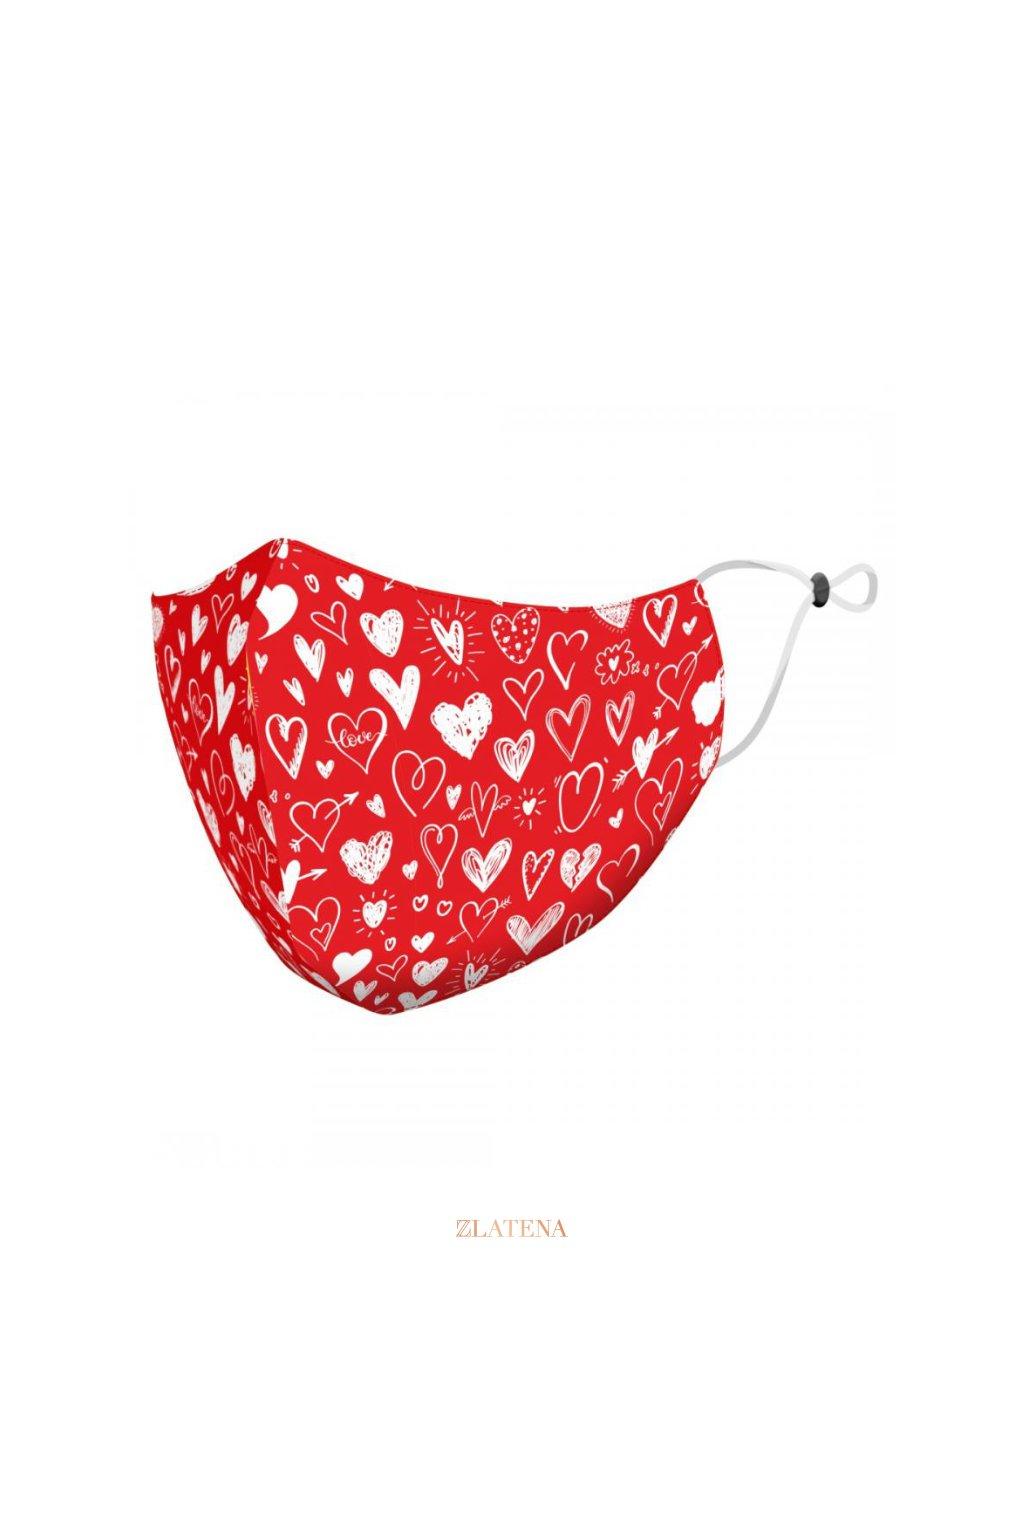 rusko hearts 01